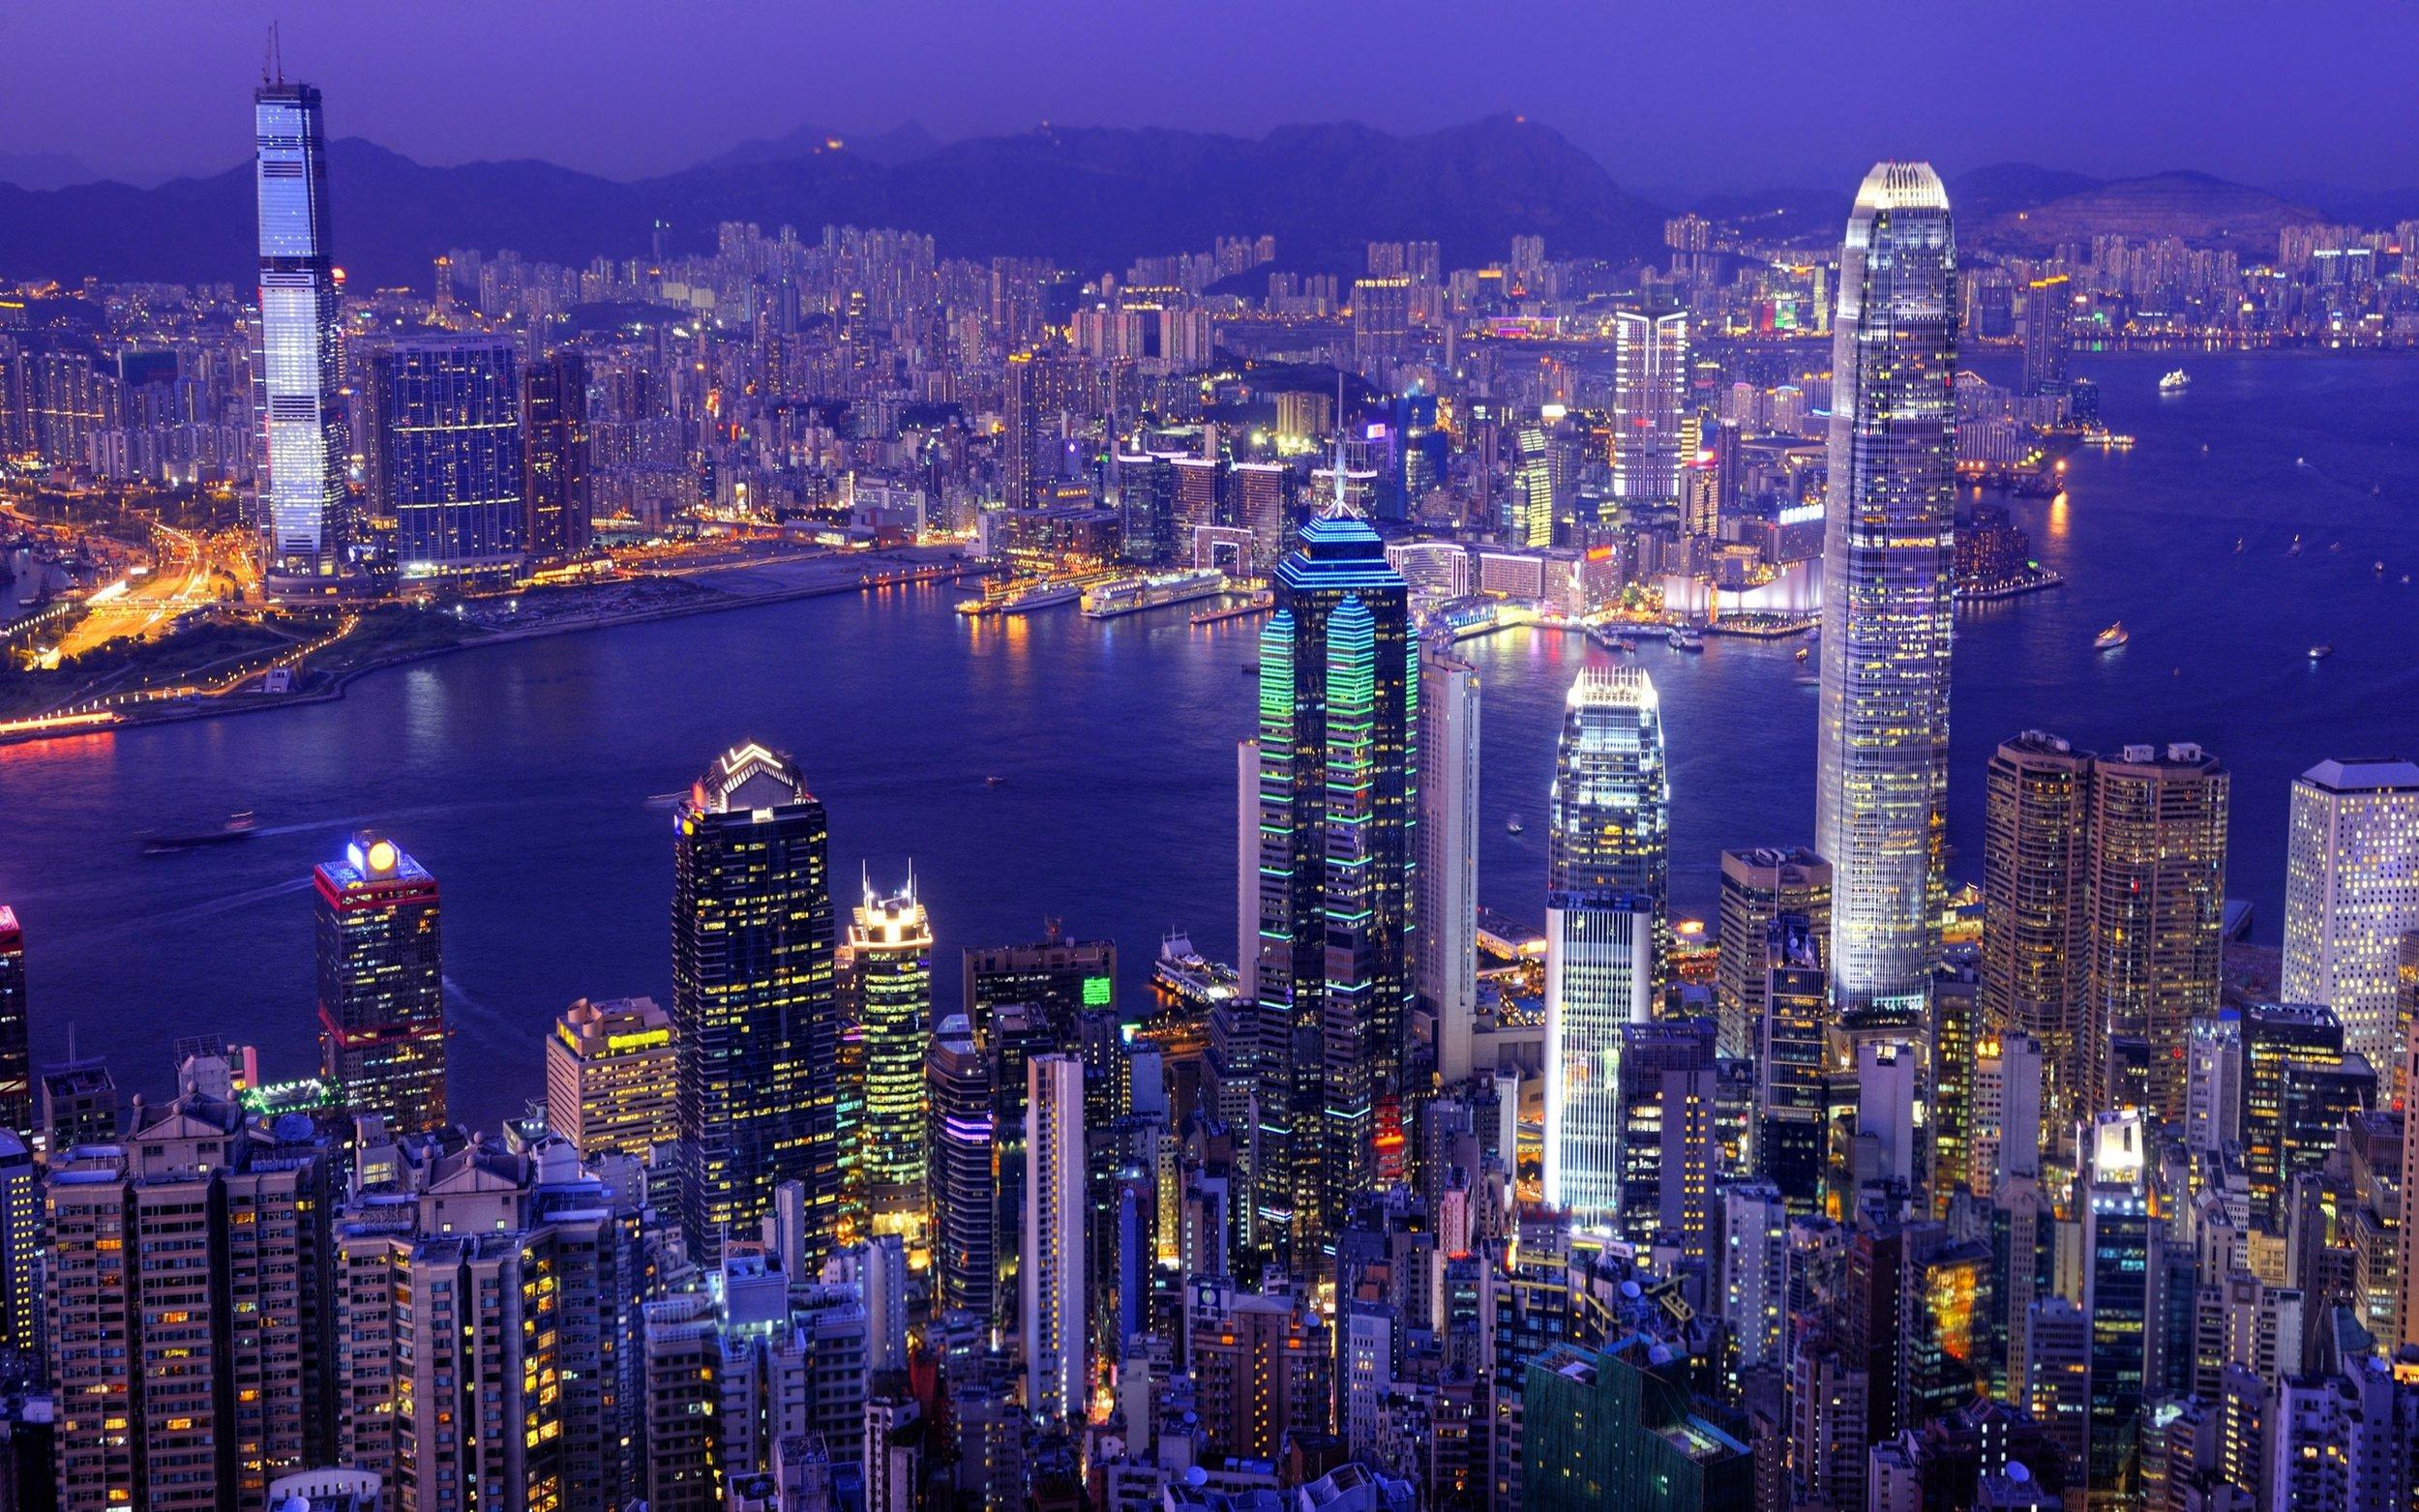 Asia-City-Hong-Kong-China-Port-Victoria-Harbour-Skyscrapers-buildings-lit-night-light-Desktop-Wallpaper-2560x1600.jpg